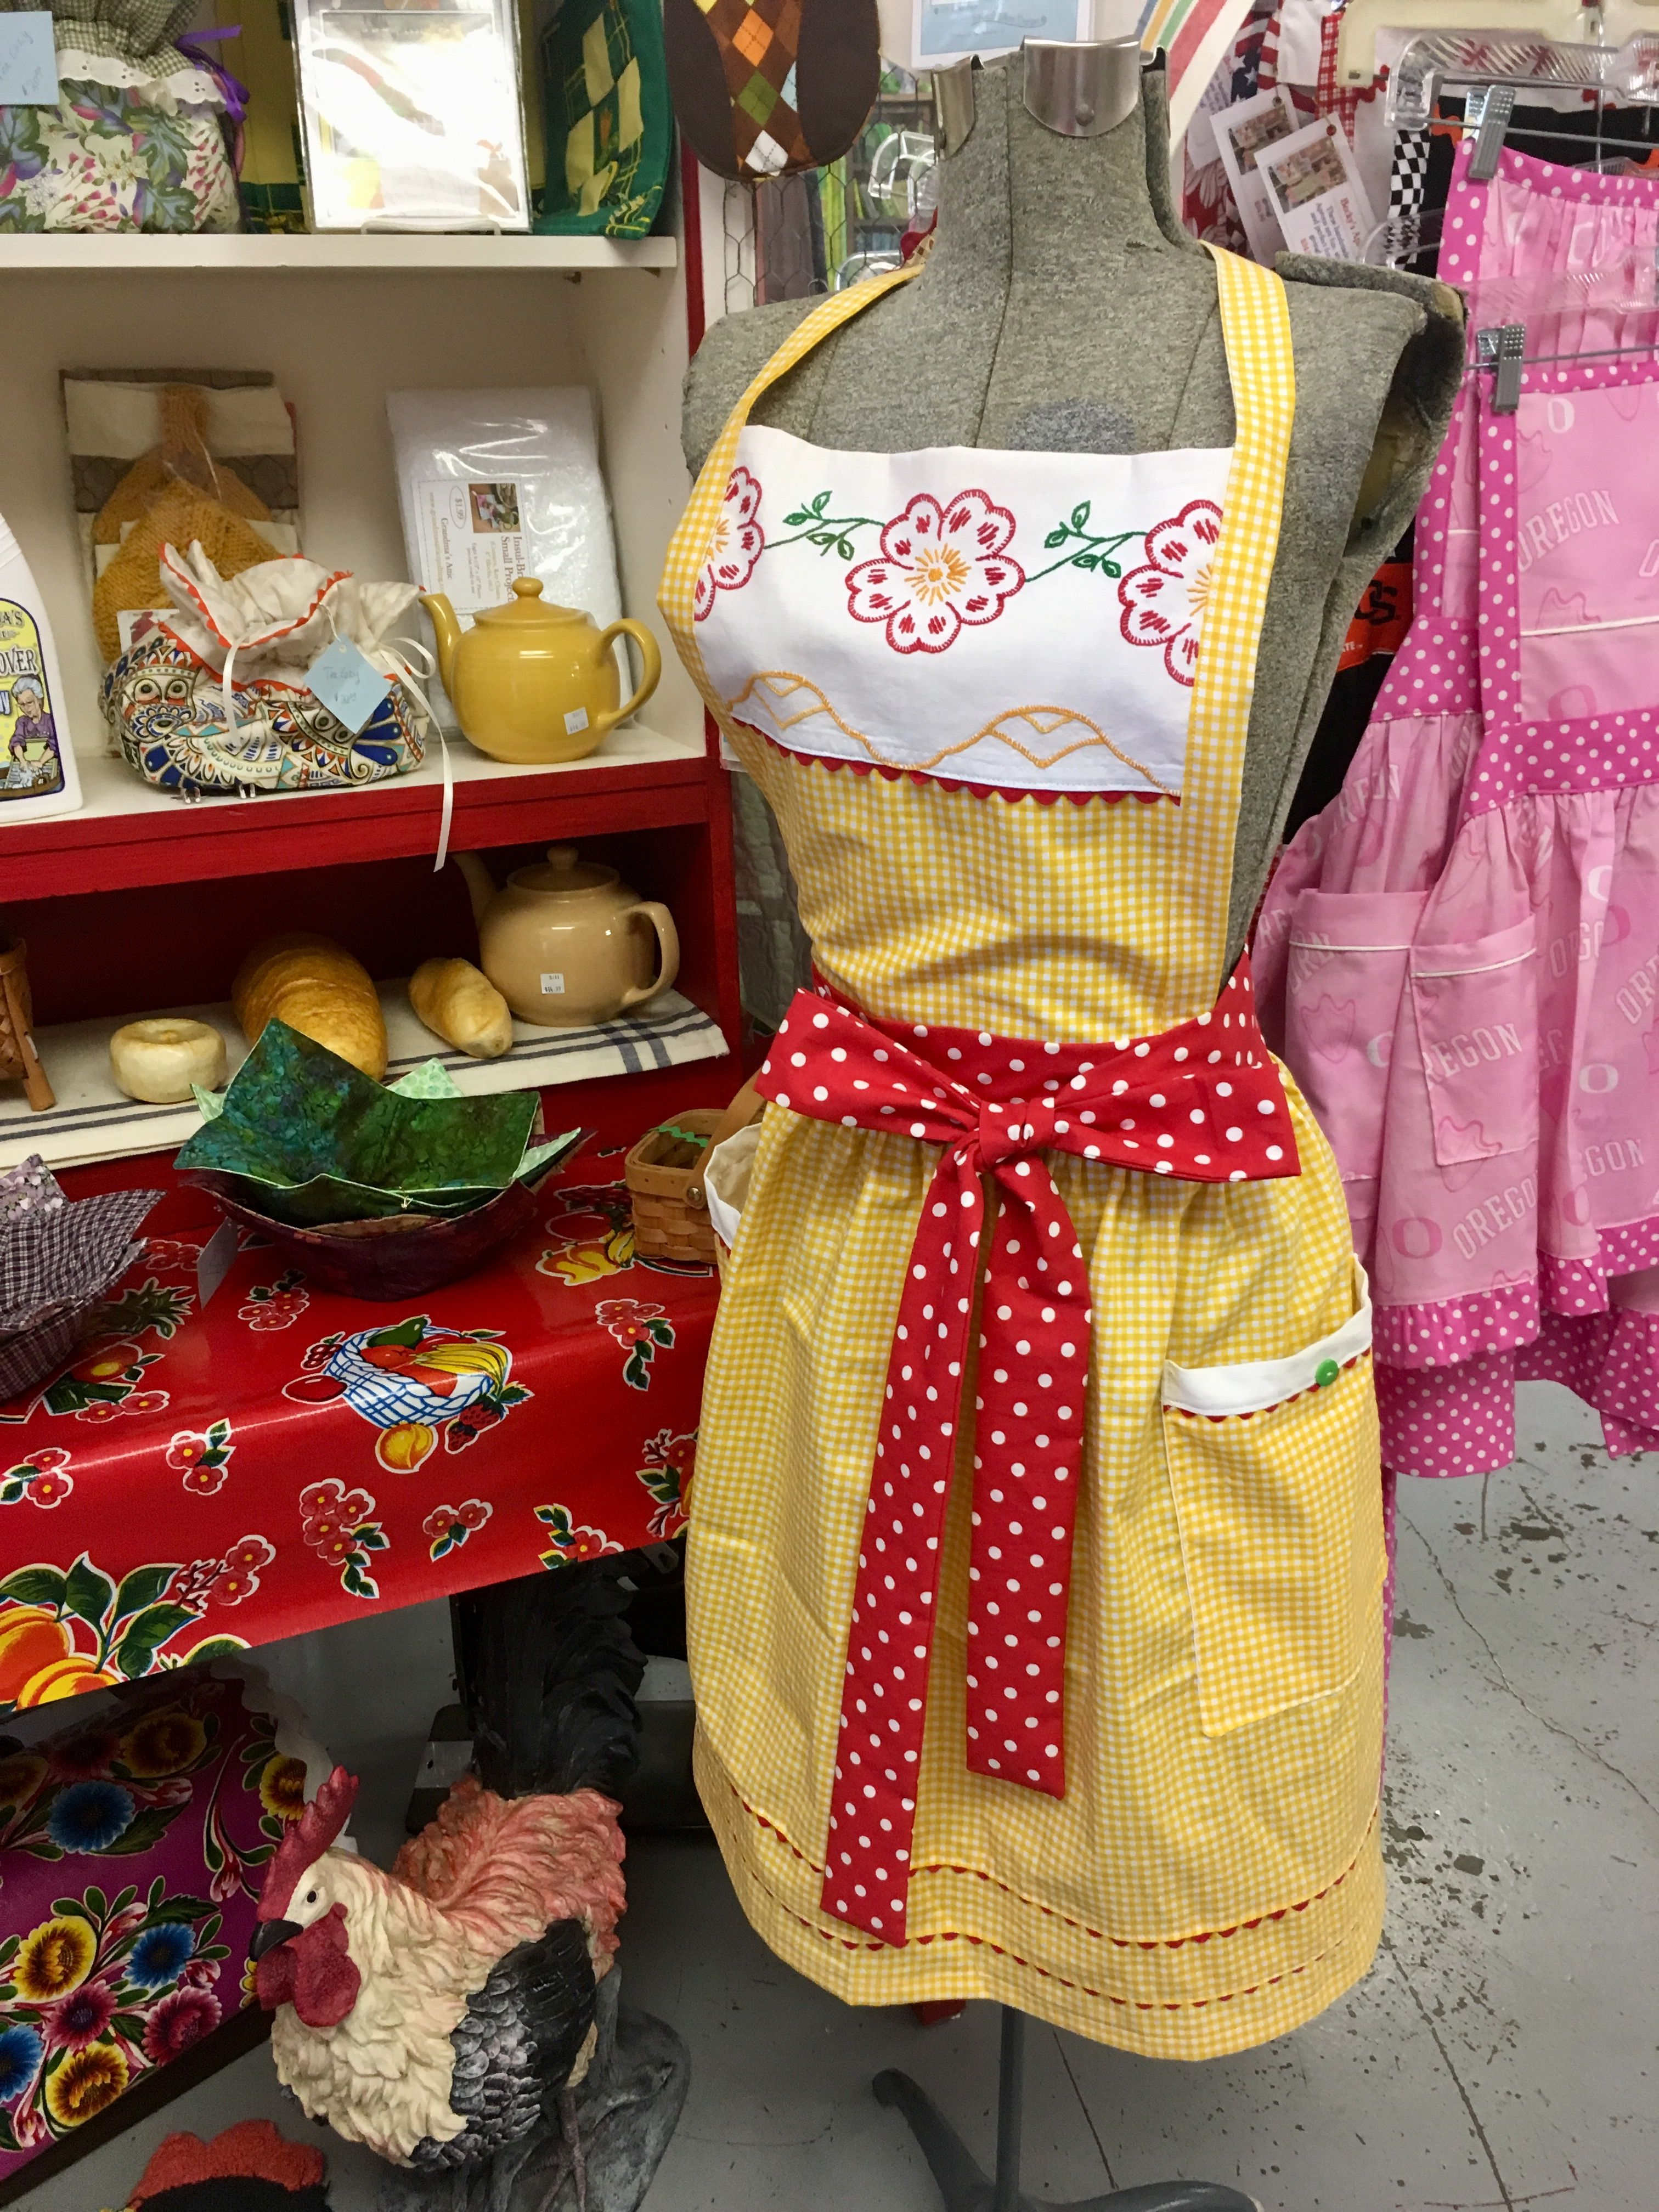 Retro Yellow and Red Kitchen Apron | Apron Love | Apron ...